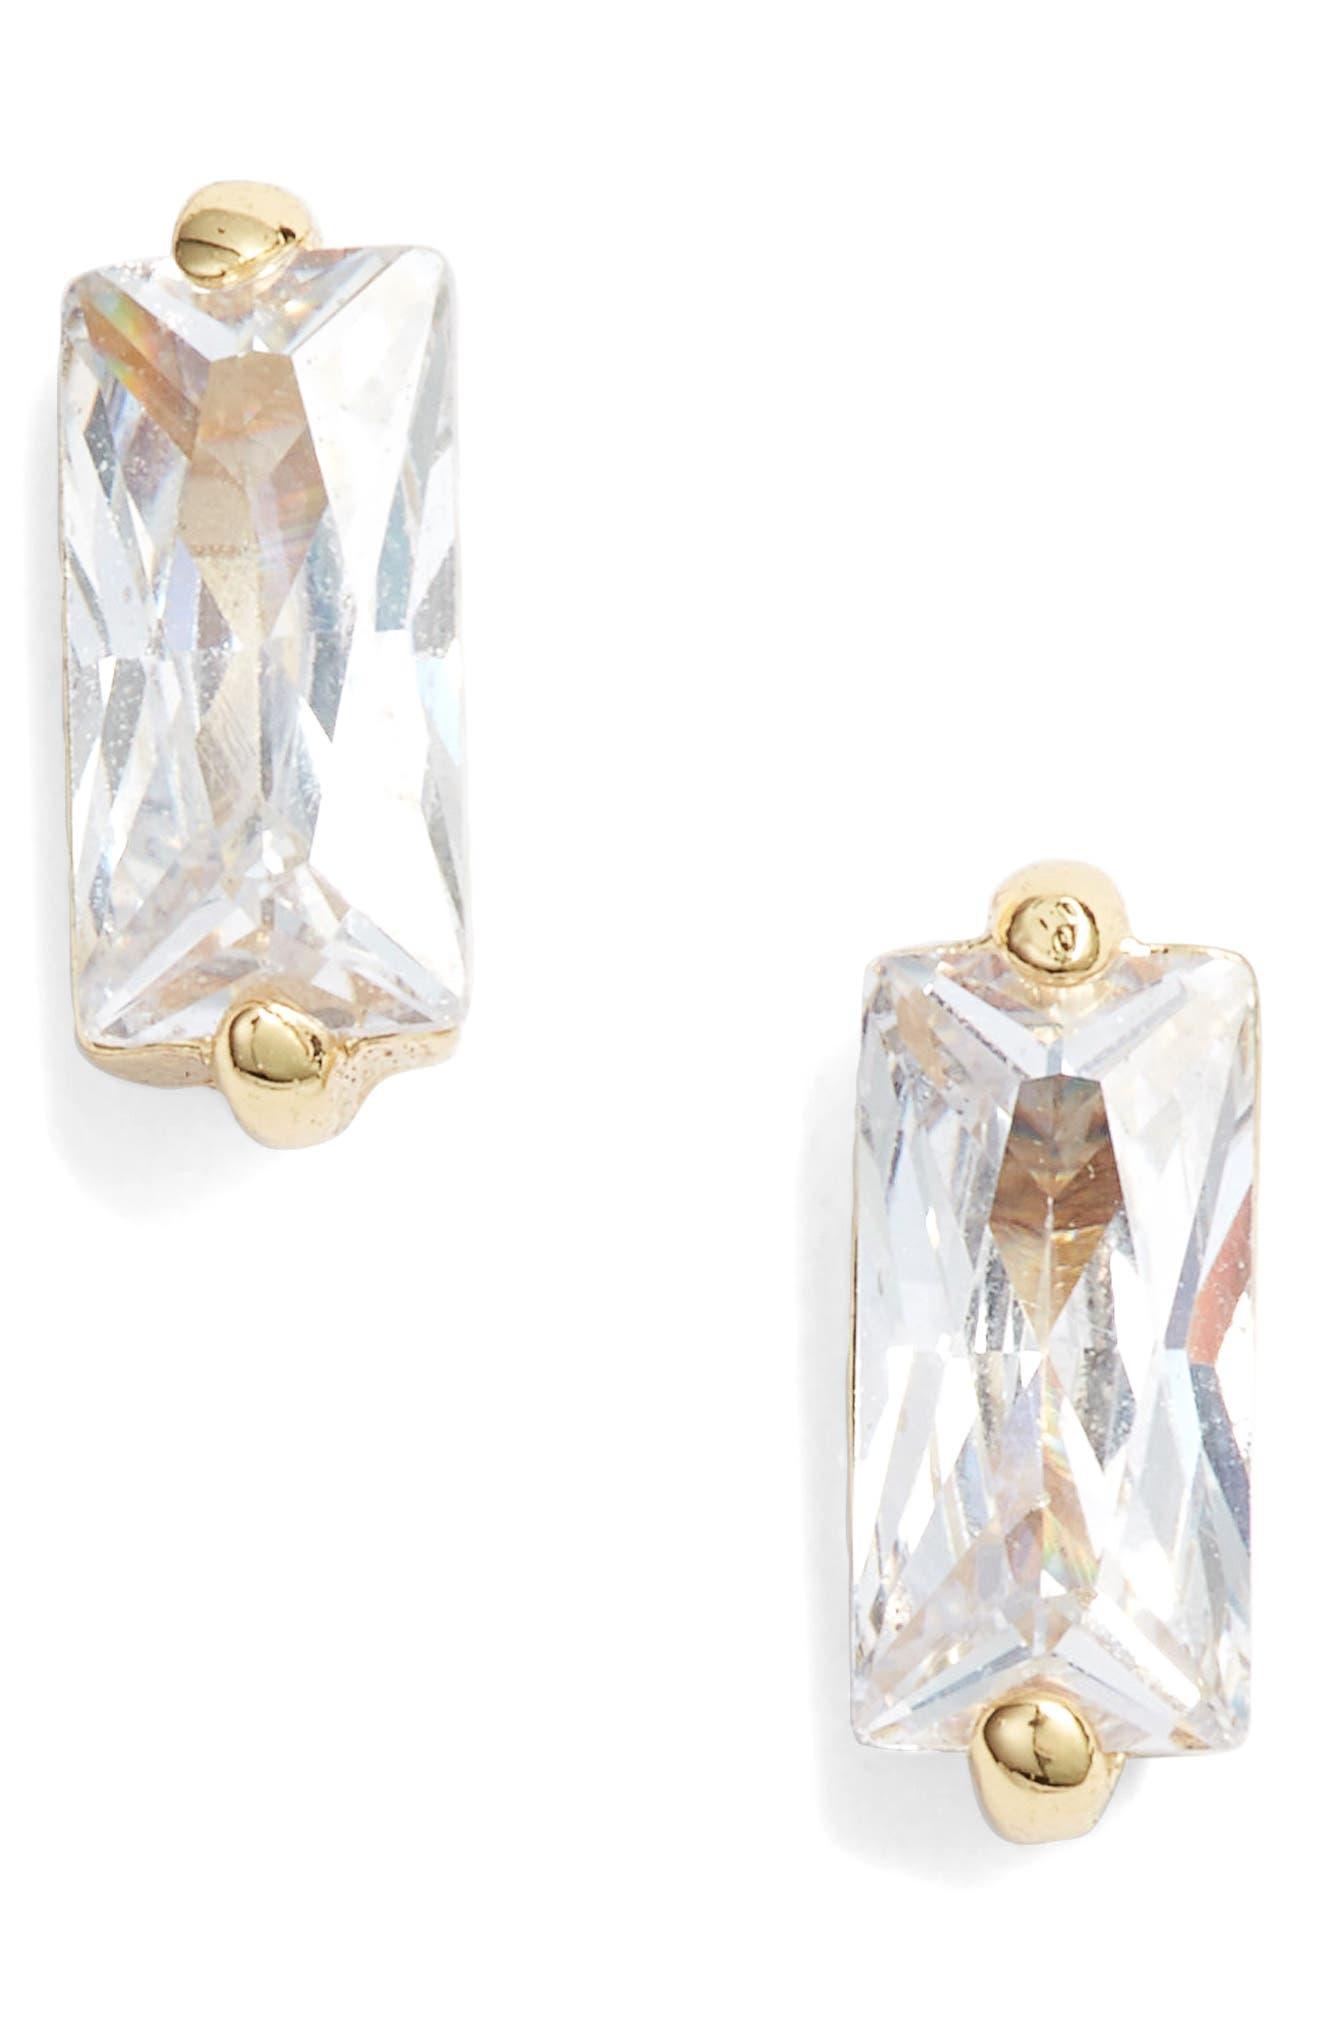 GORJANA Amara Stud Earrings, Main, color, GOLD